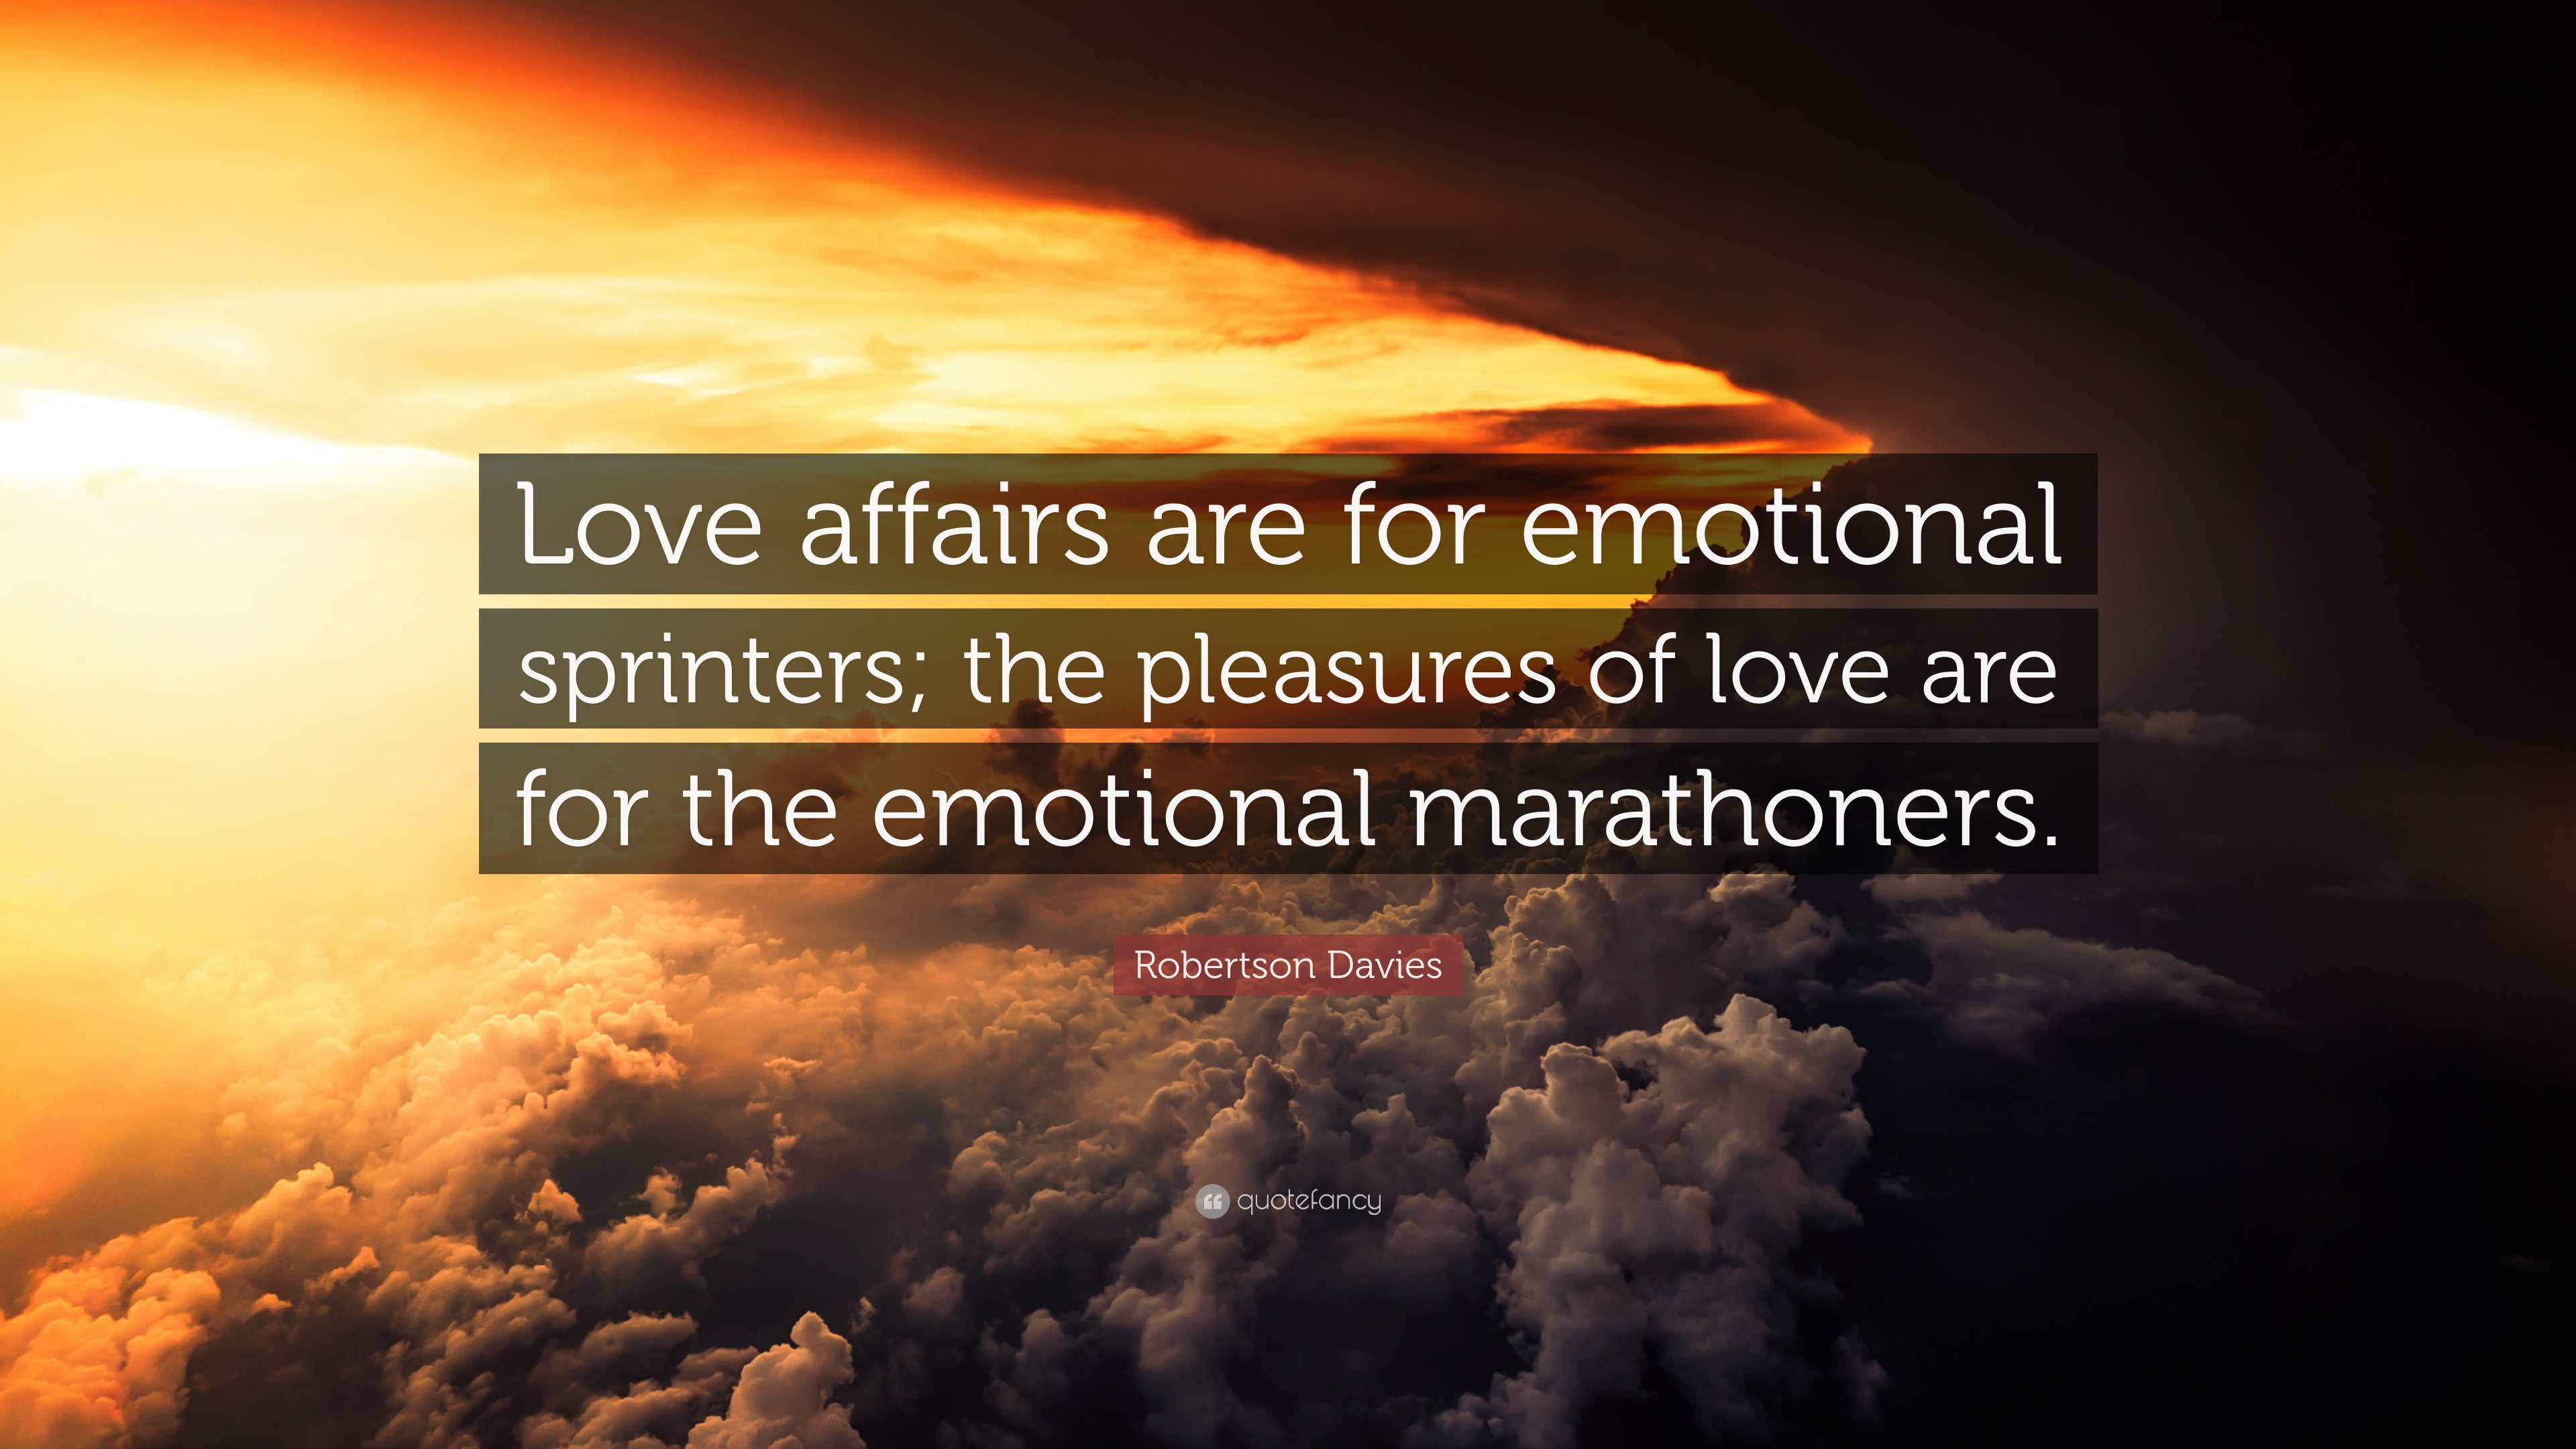 Pleasures of love essay robertson davies